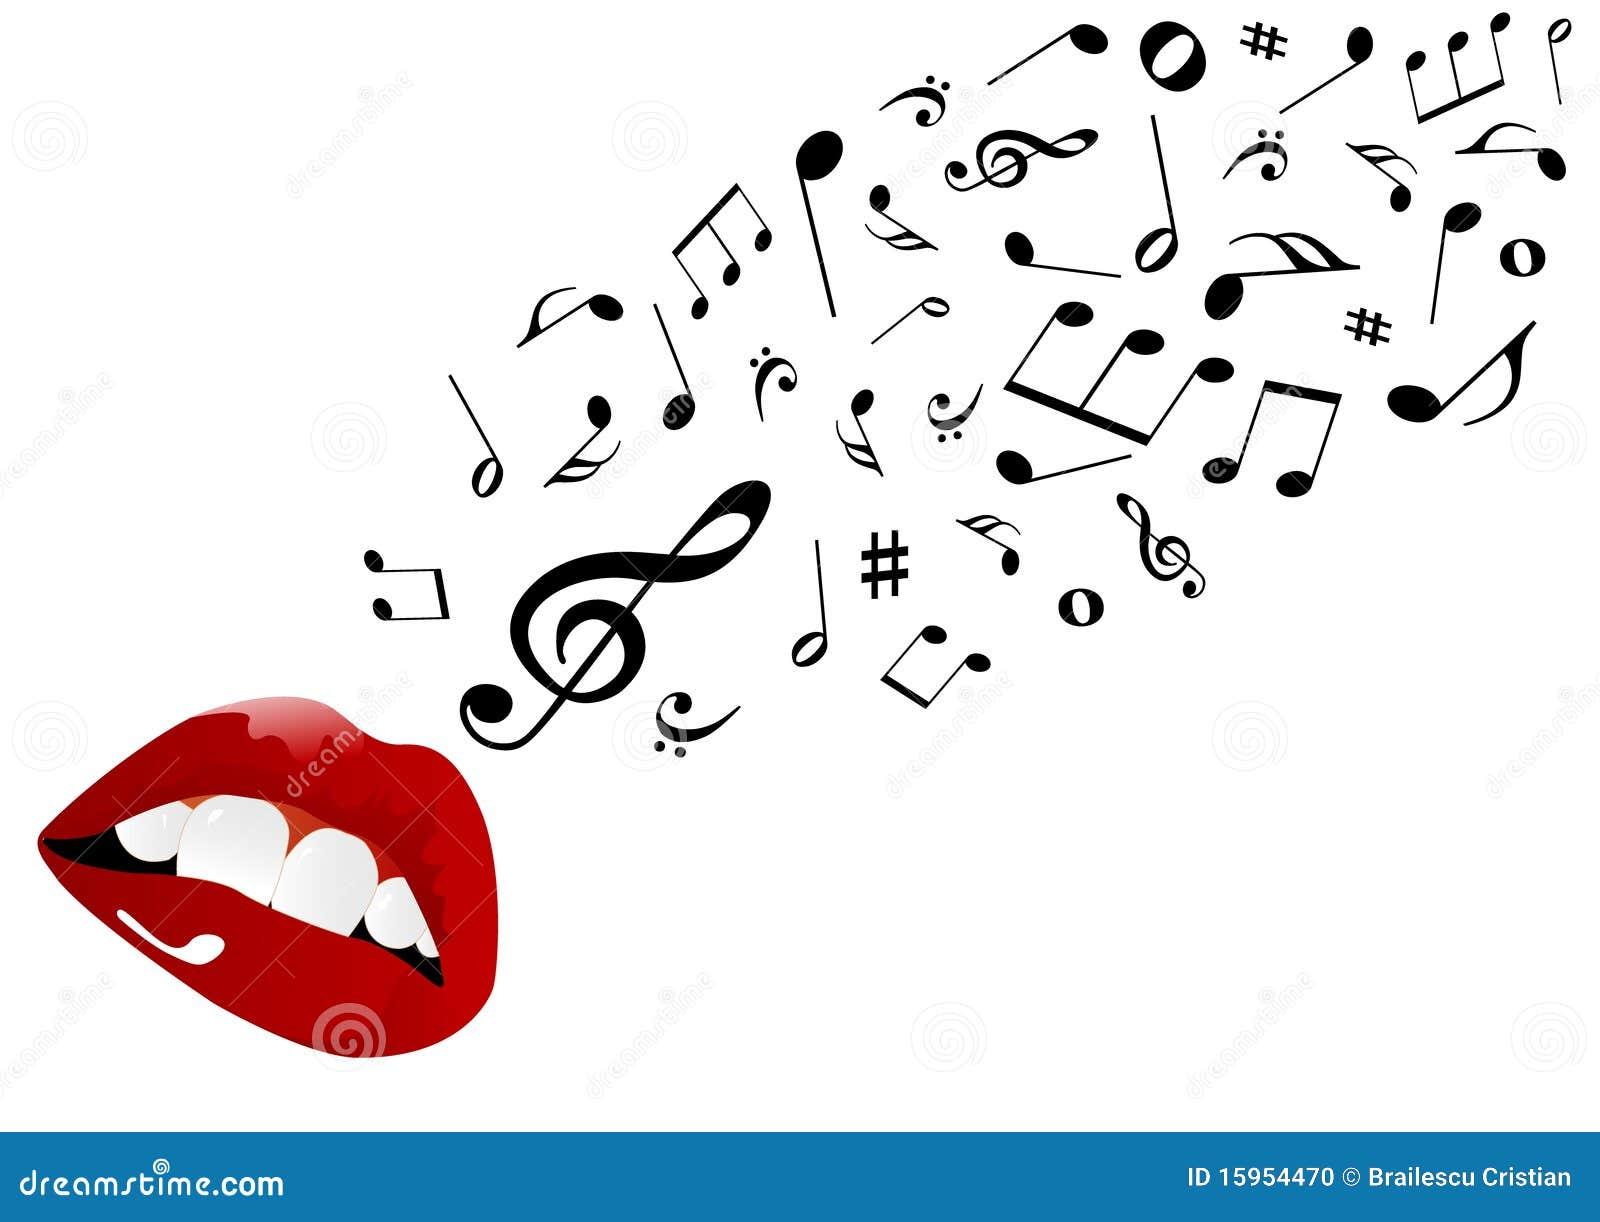 Illustration Of Red Lips Singing Stock Photo - Image: 15954470